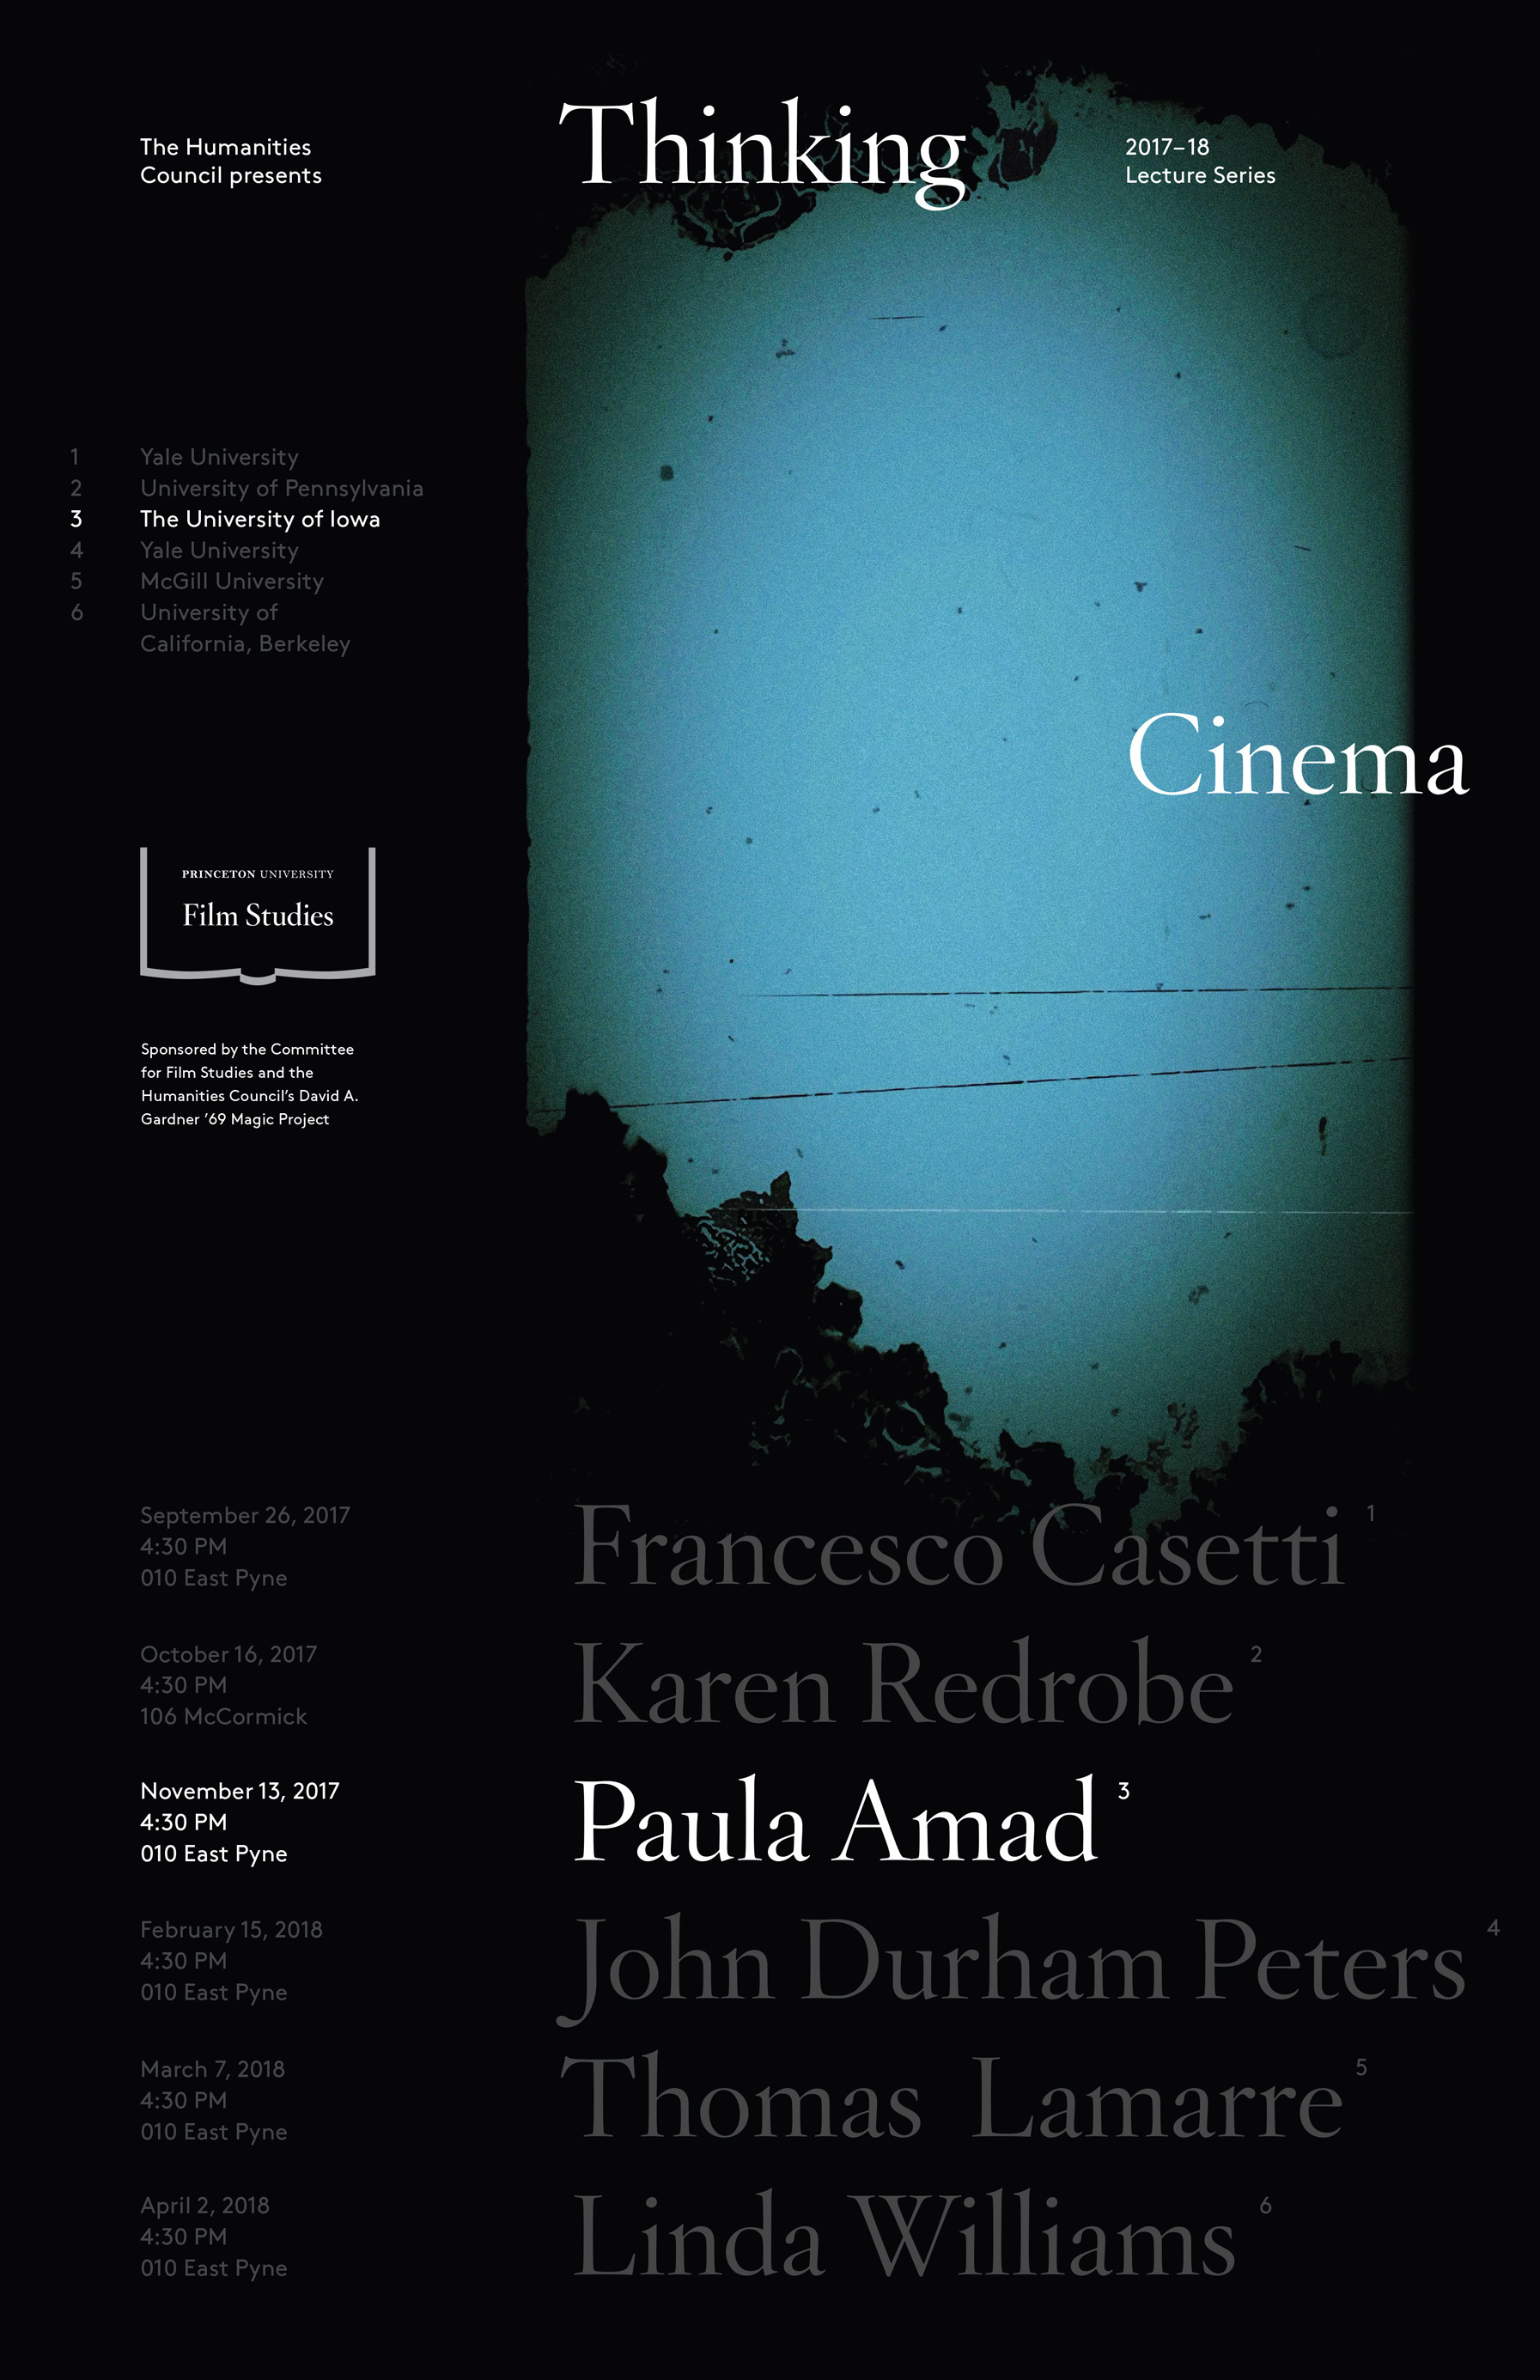 Thinking-Cinema_ac-3.jpg